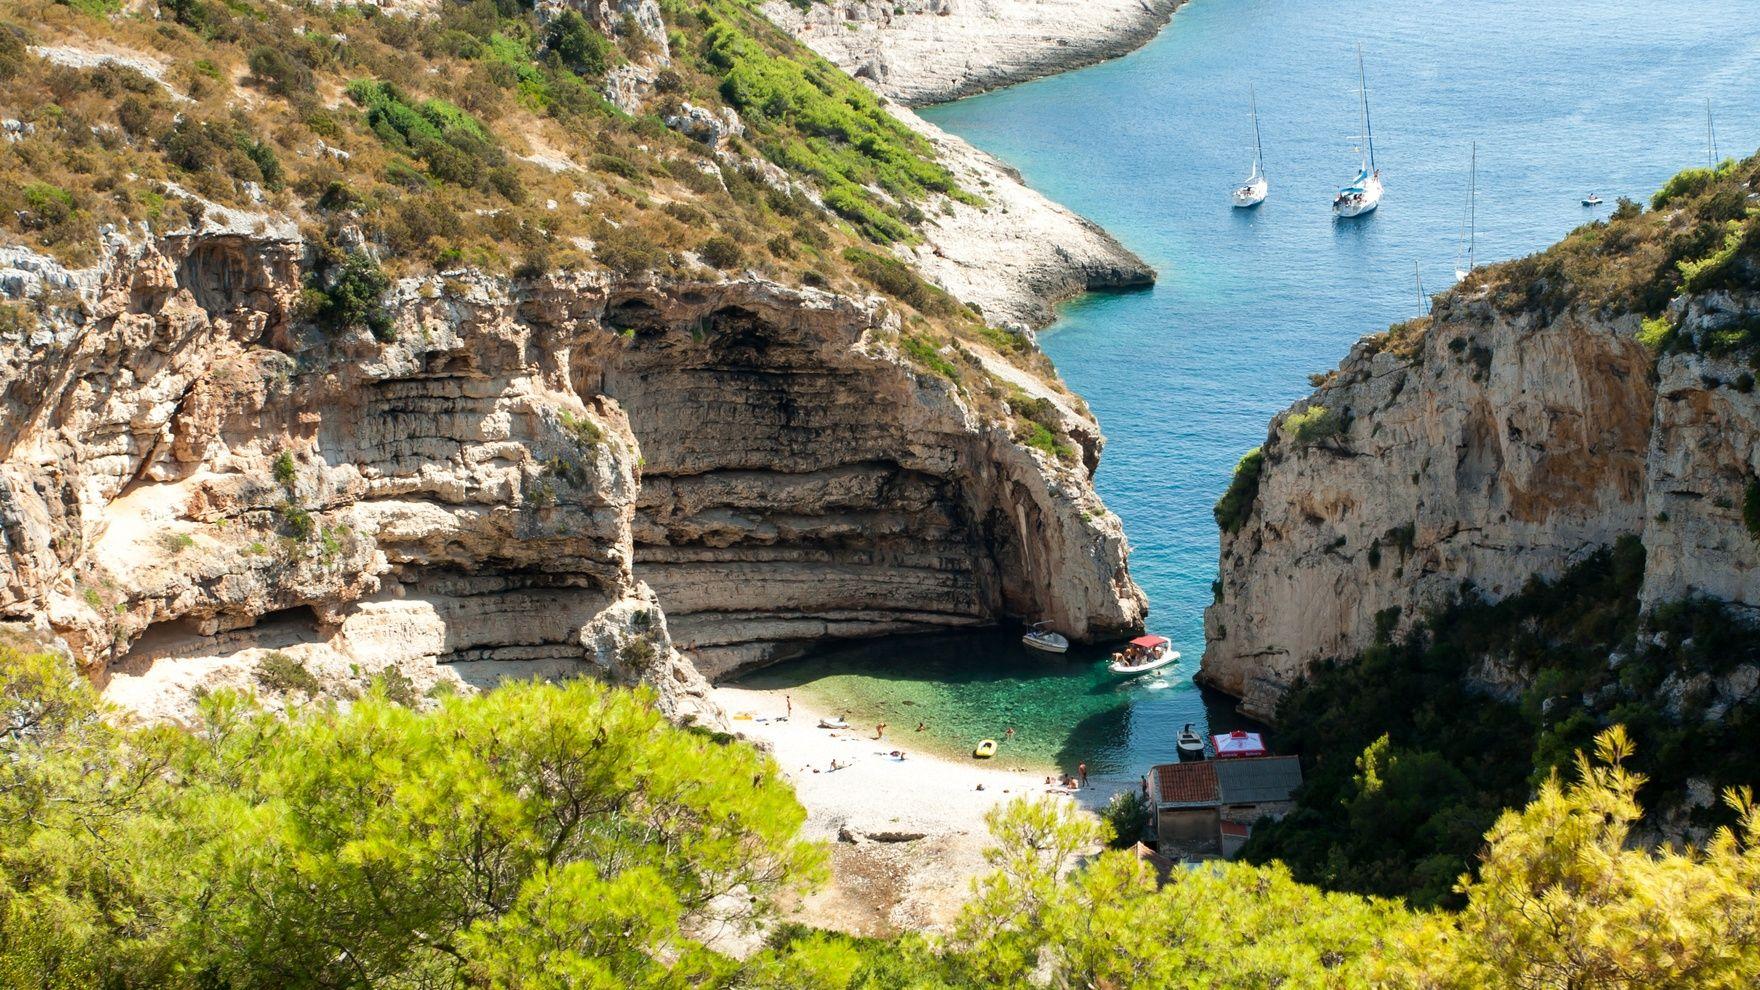 Croatia, August in the Adriatic